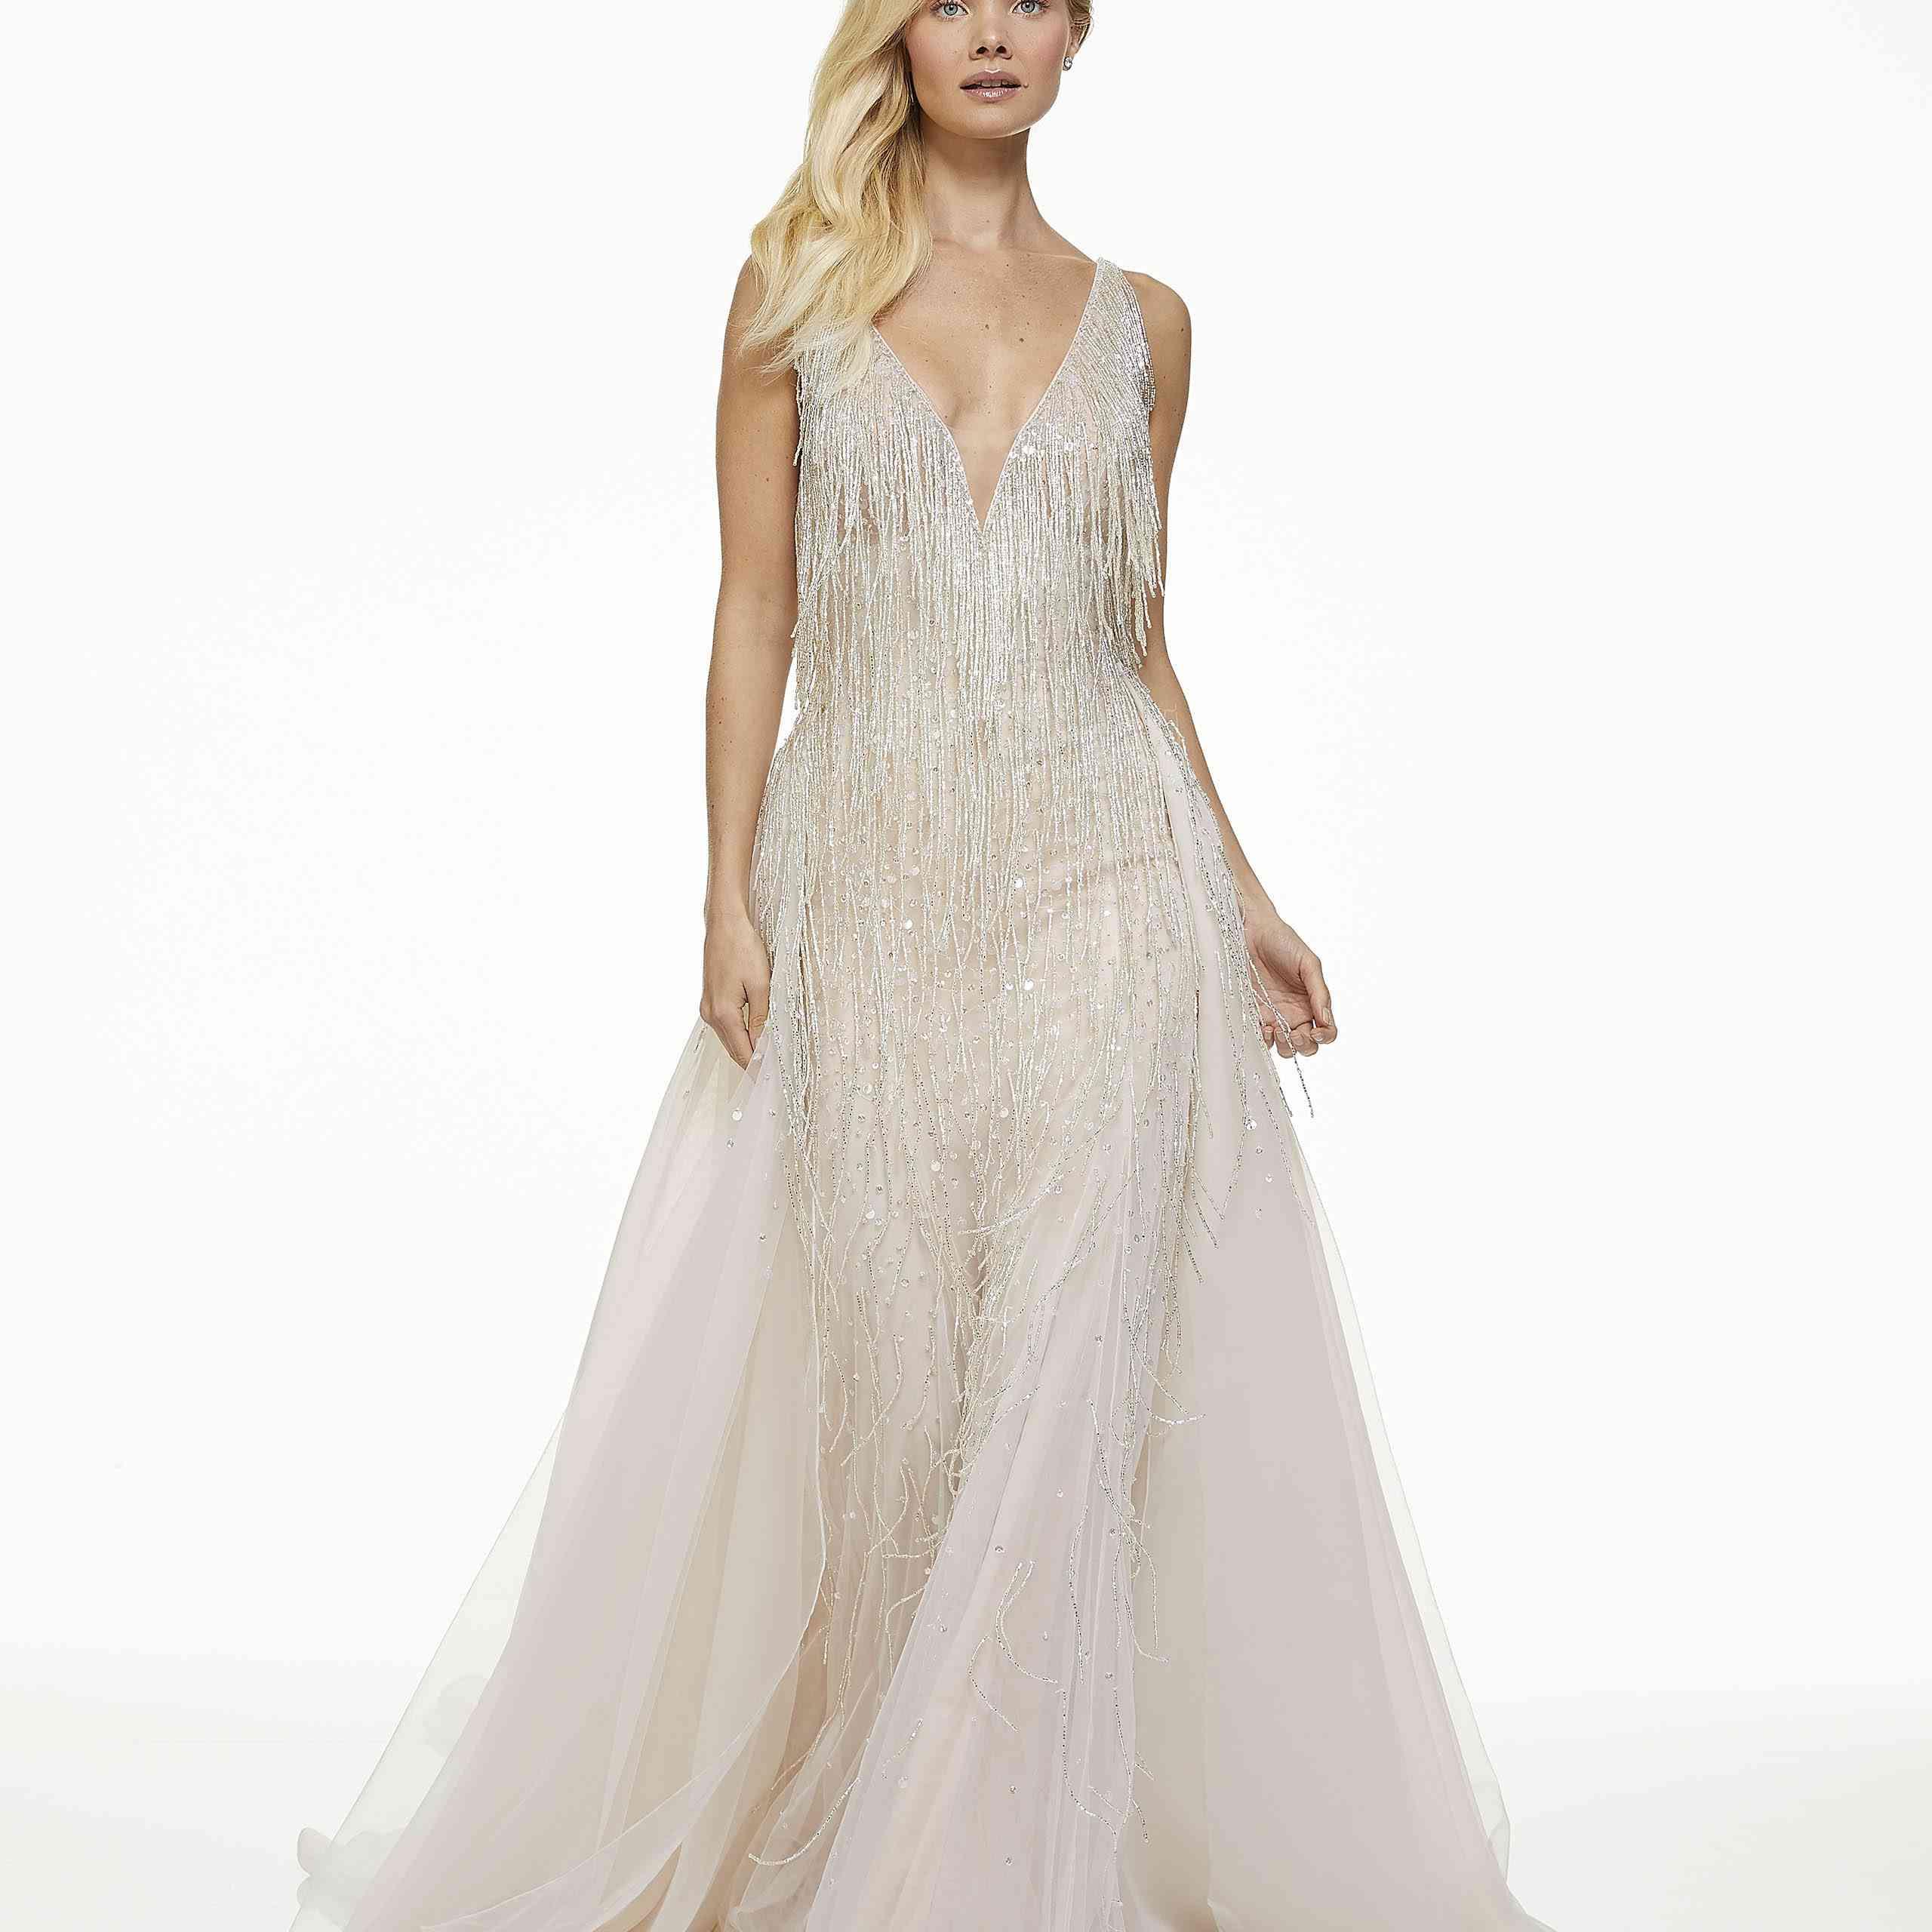 Model in deep v-cut fringe wedding dress